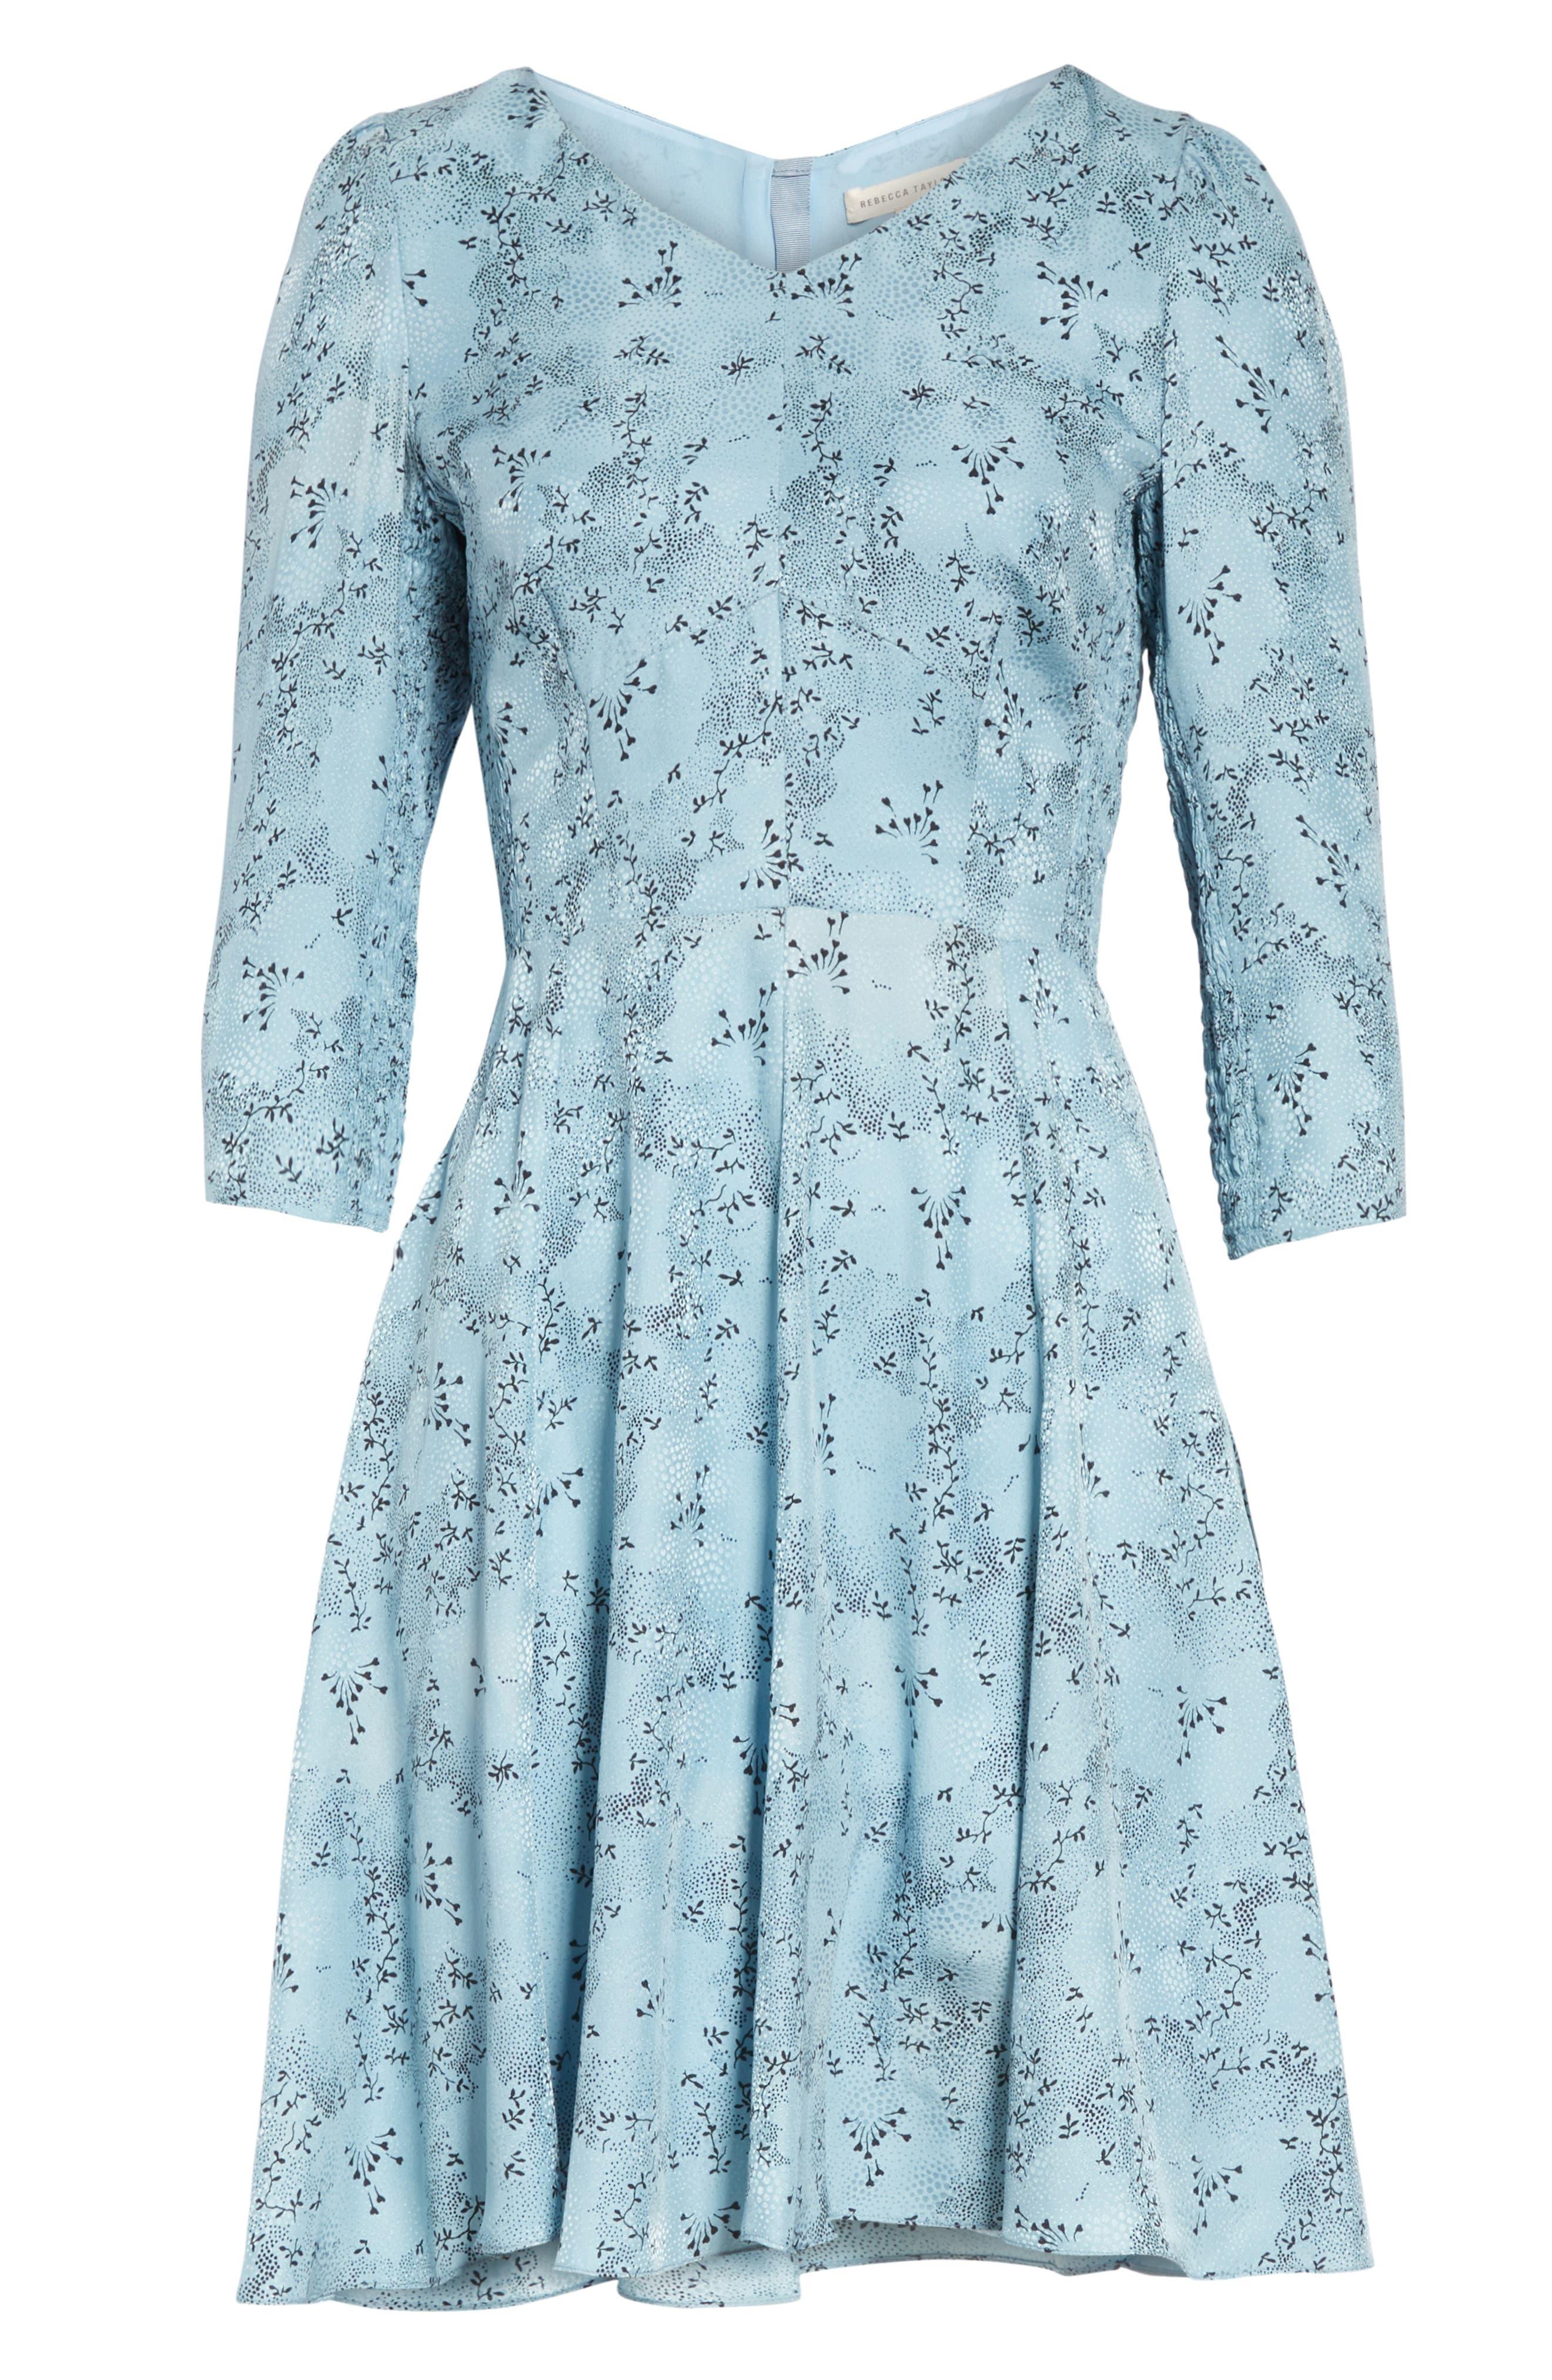 REBECCA TAYLOR, Gianna Floral Silk Dress, Alternate thumbnail 7, color, LAGOON COMBO